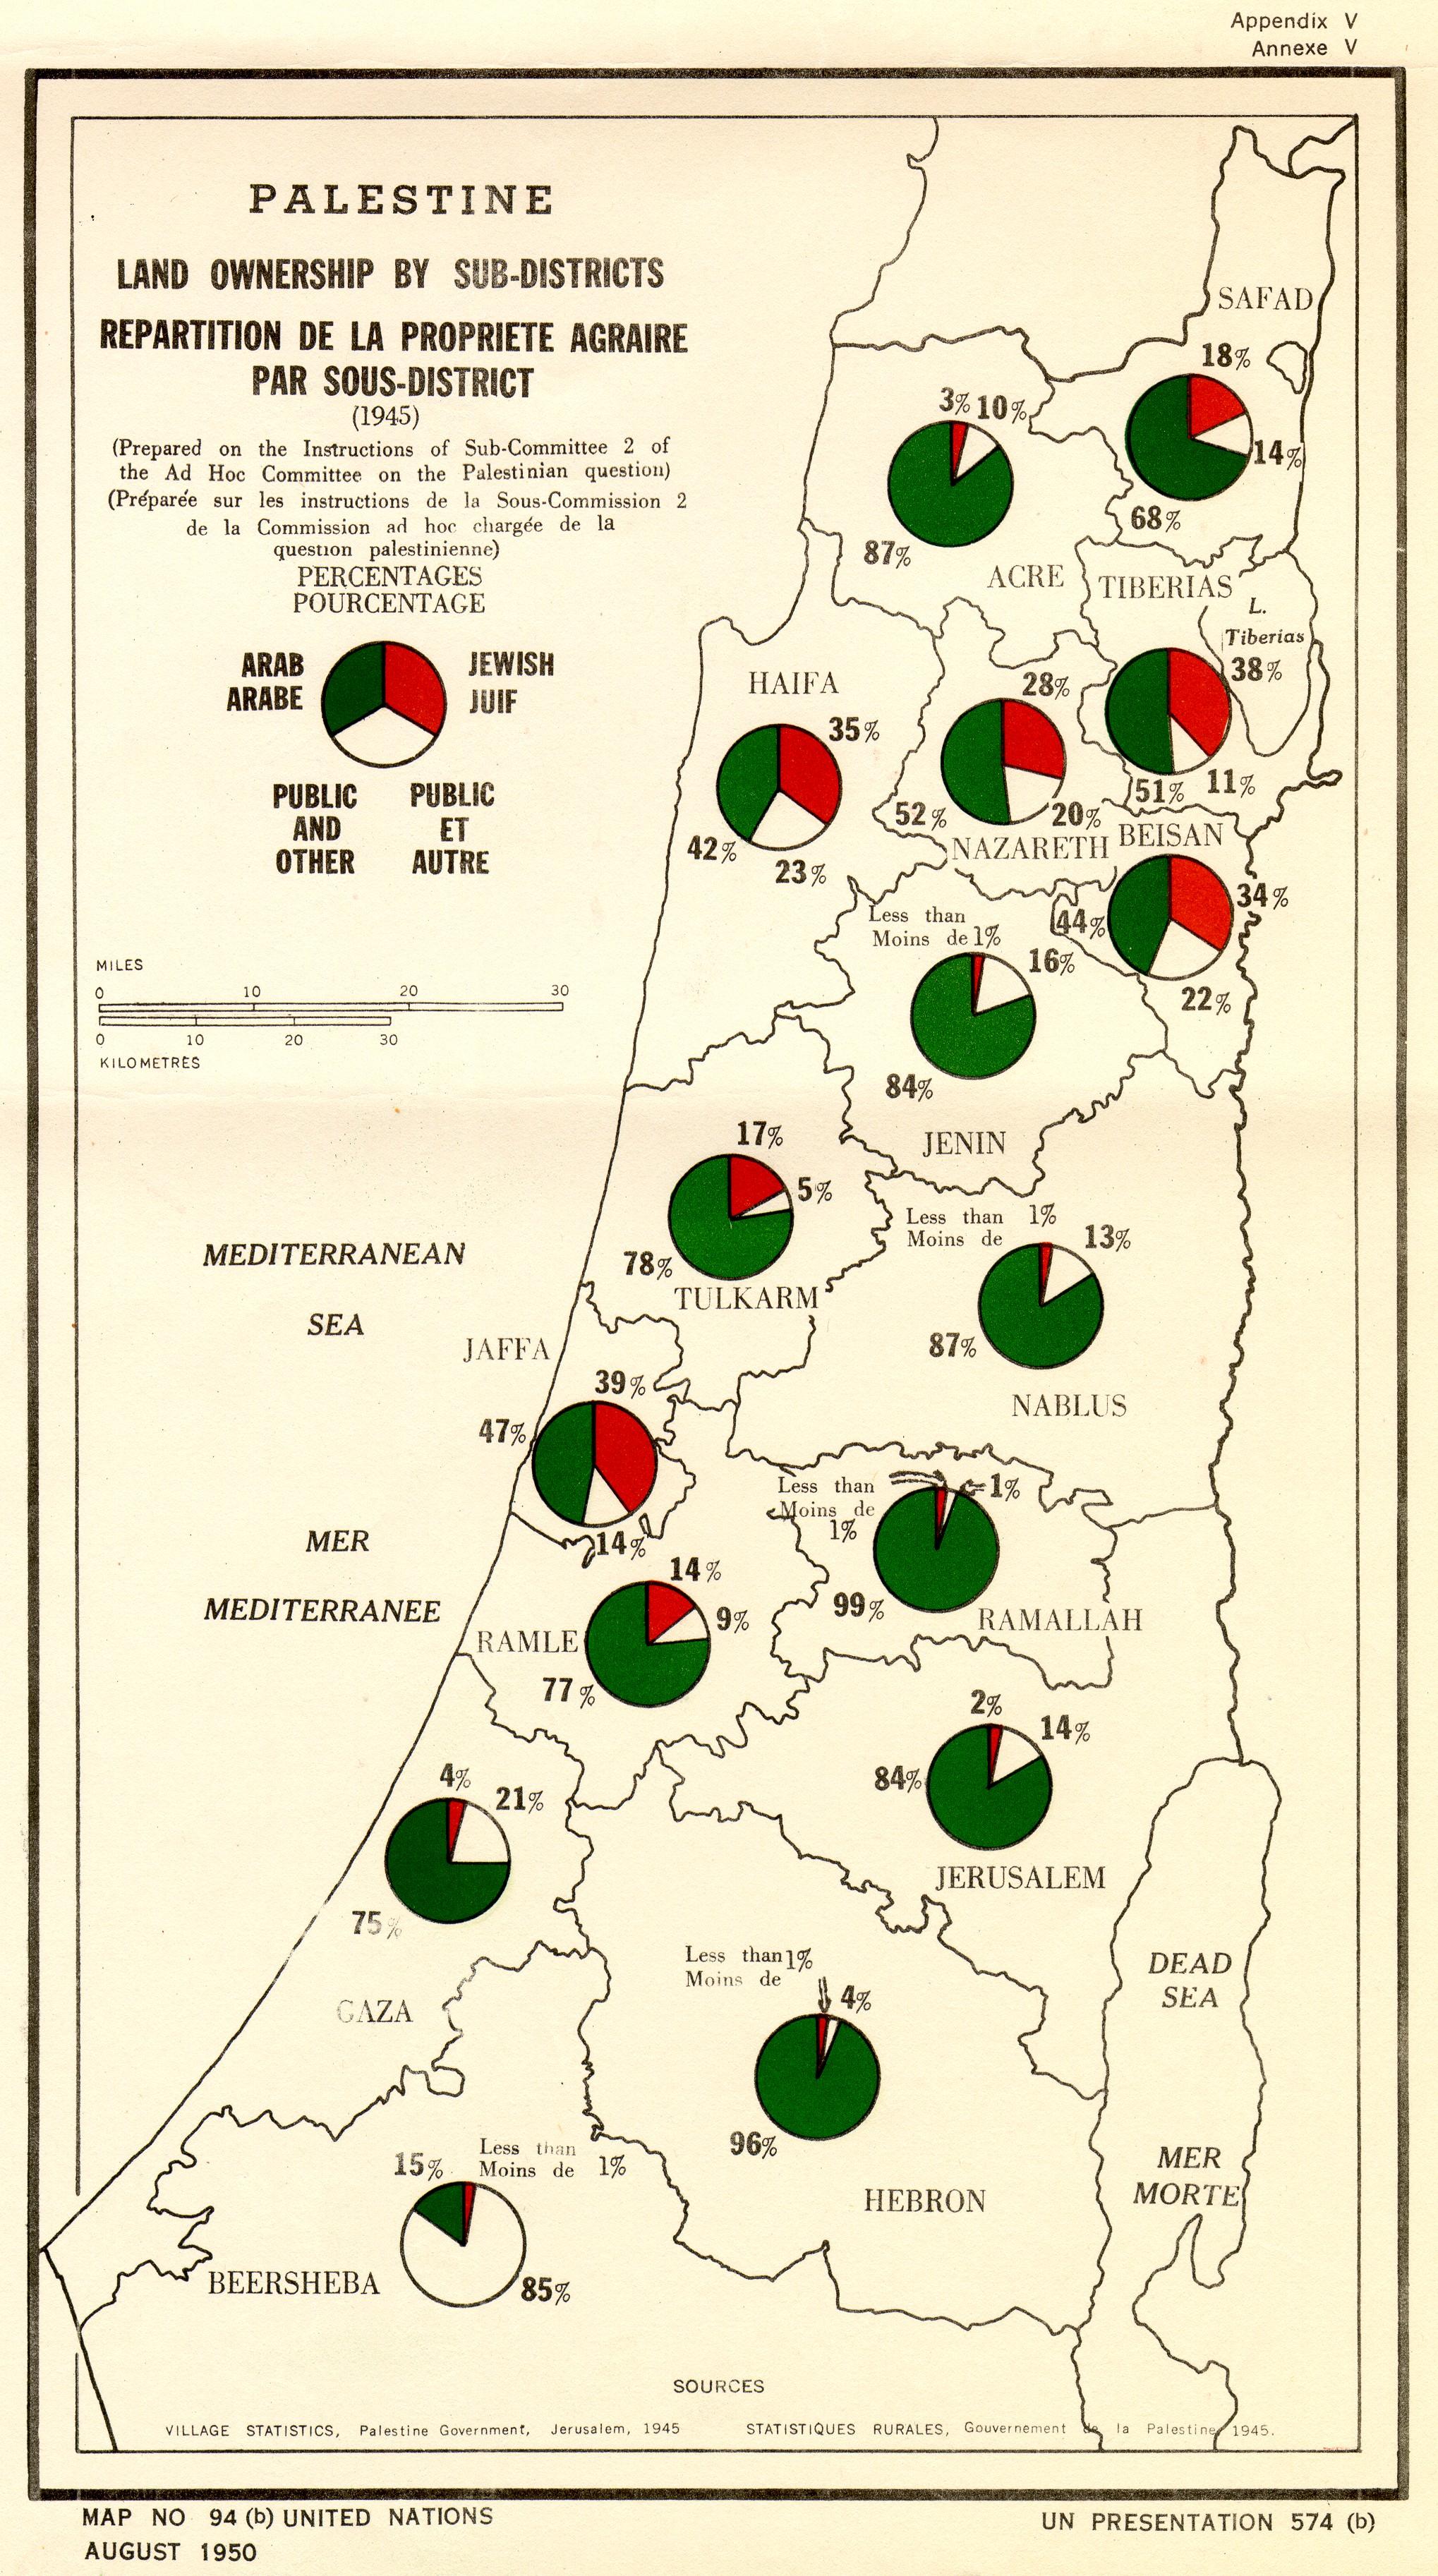 Palestine_Land_ownership_by_sub-district_(1945).jpg